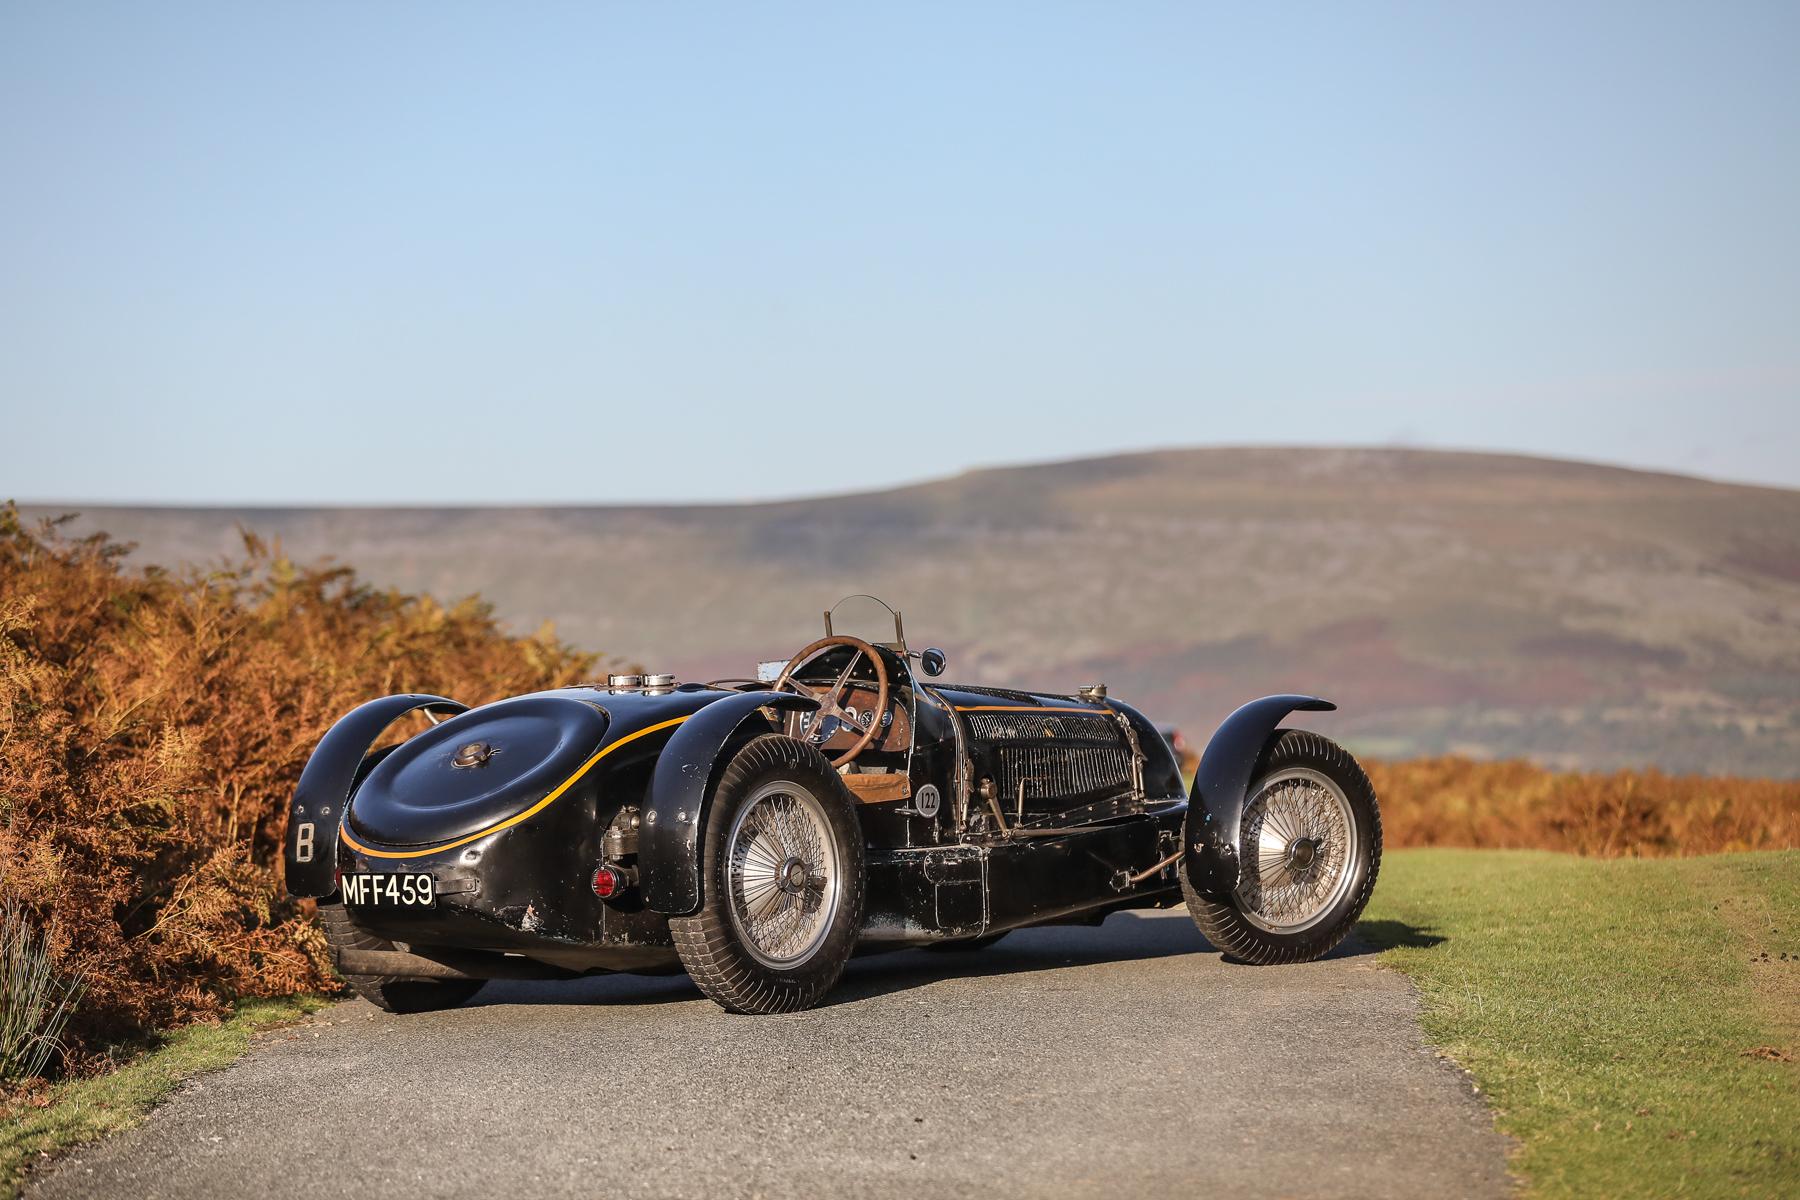 1934 Bugatti Type 59 Sports rear